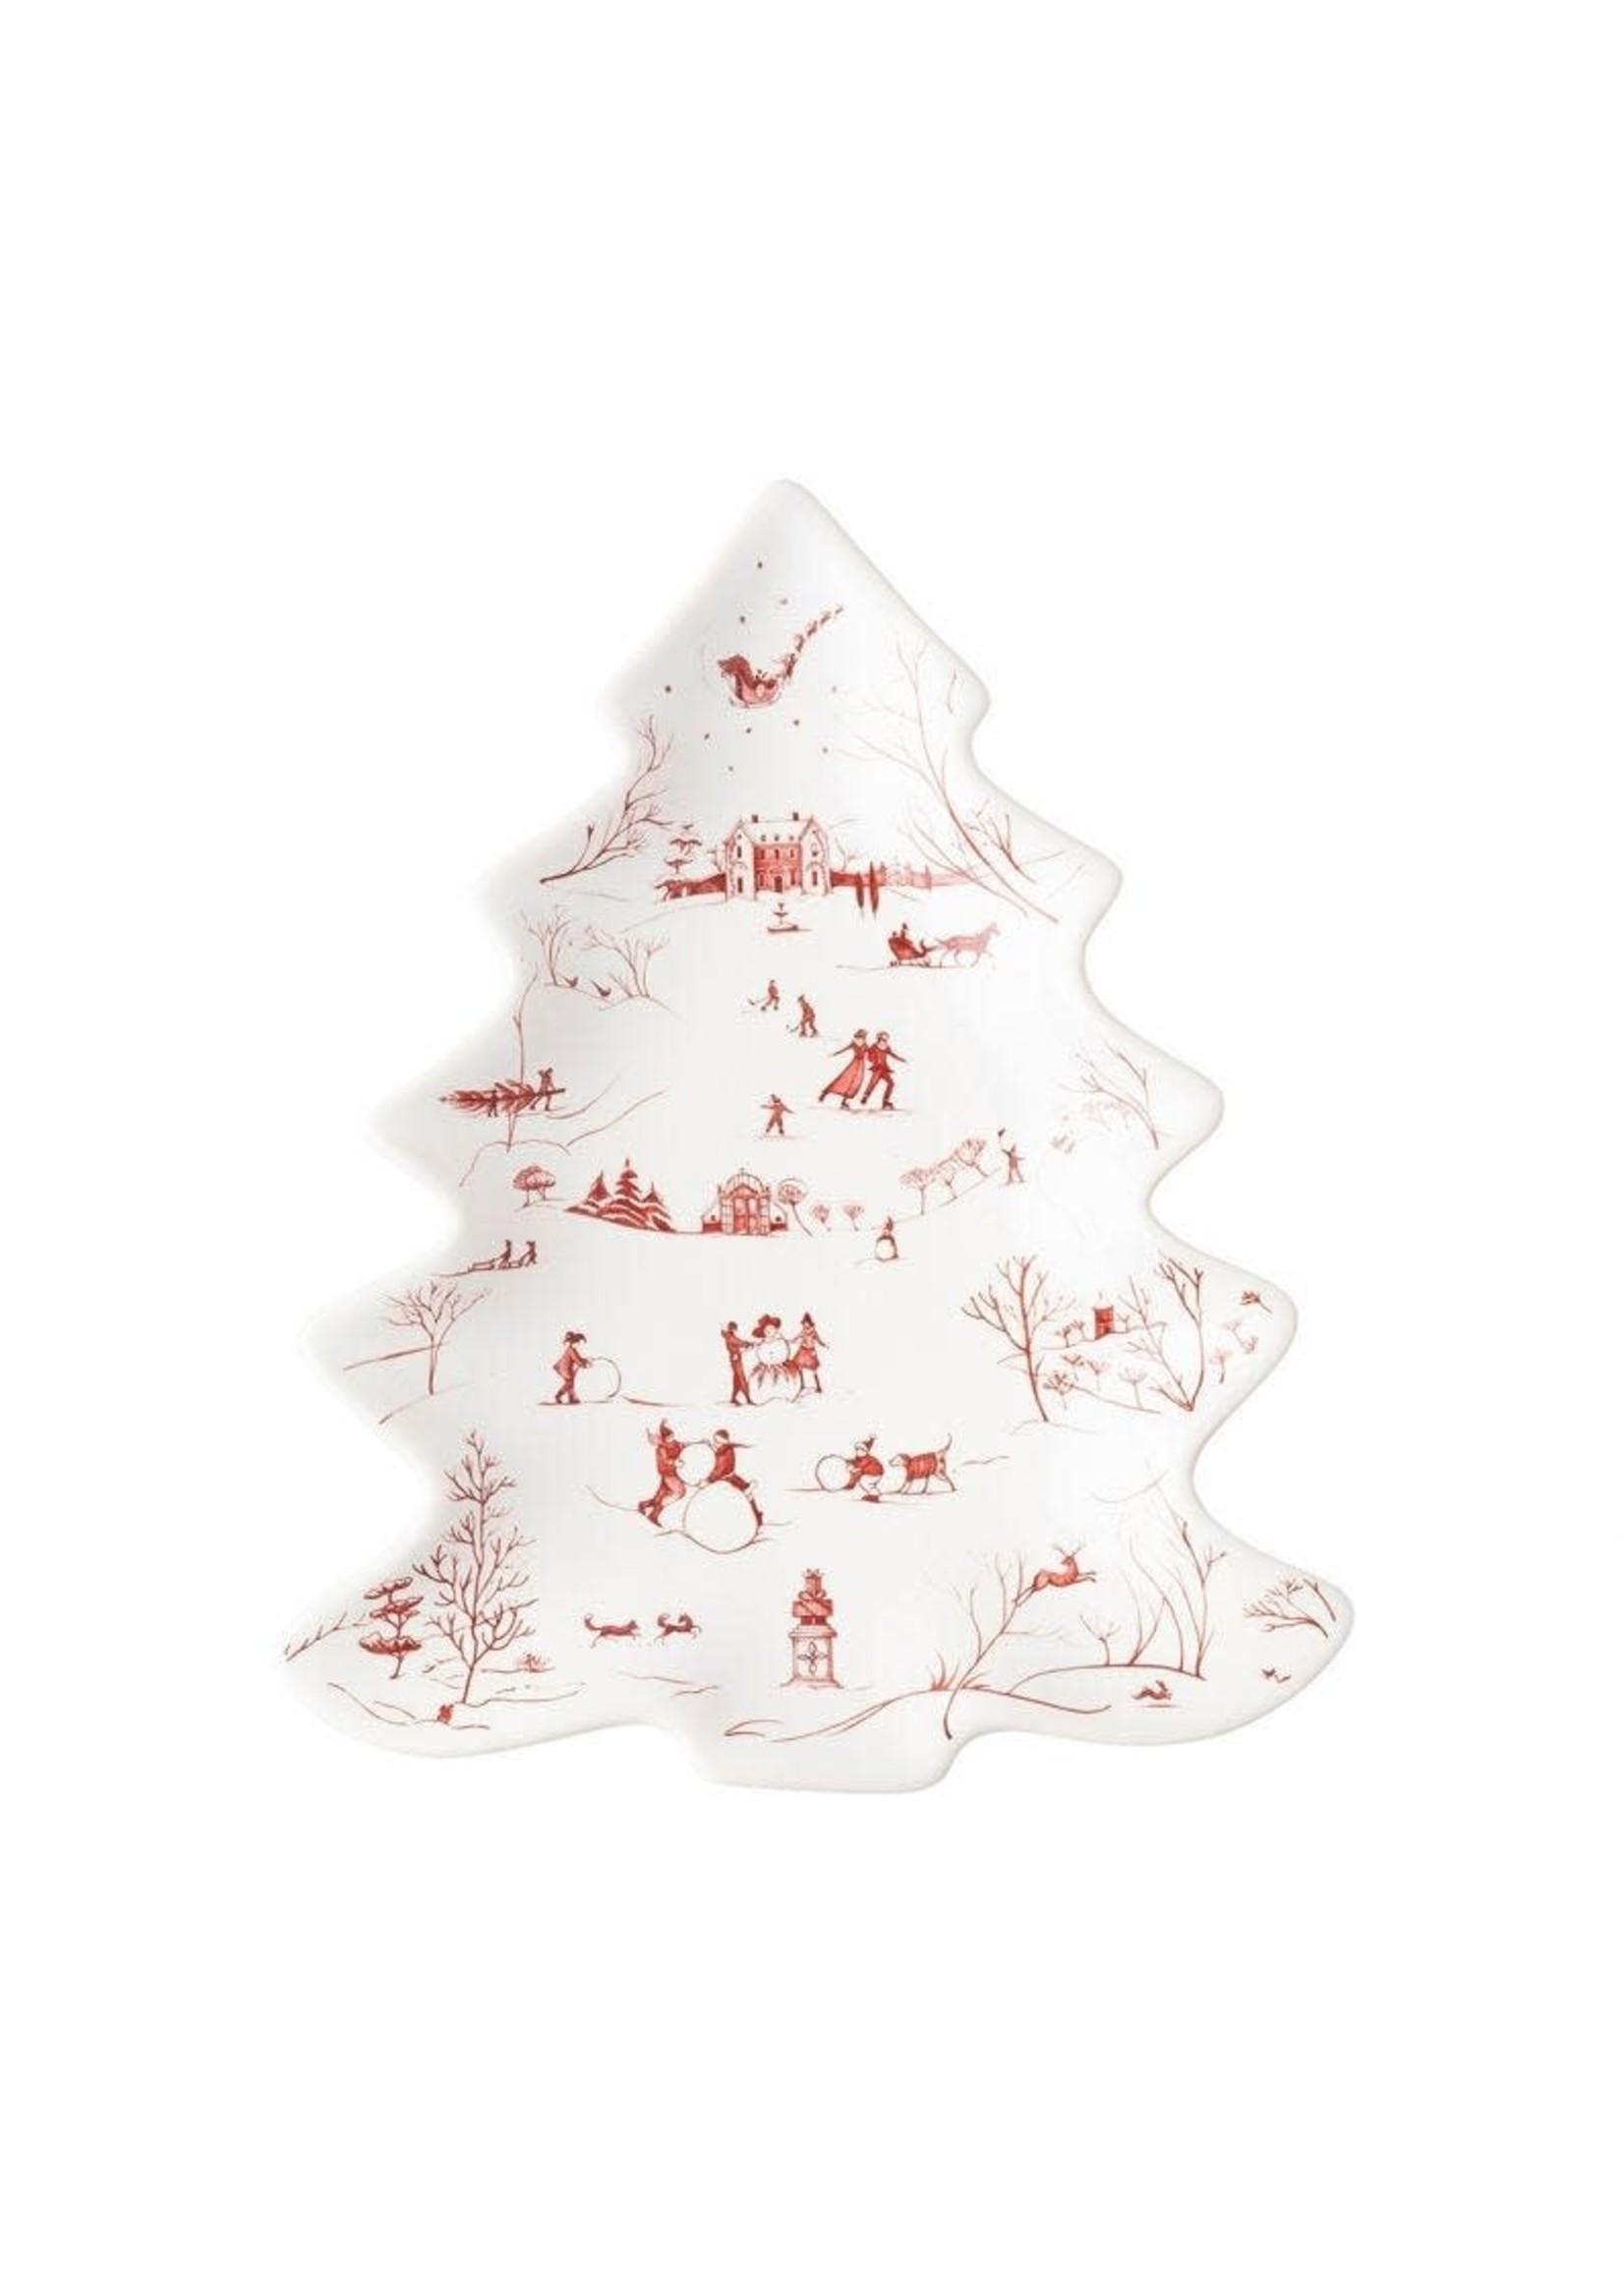 Juliska Country Estate - Ruby - Small Tree Tray - Winter Frolic